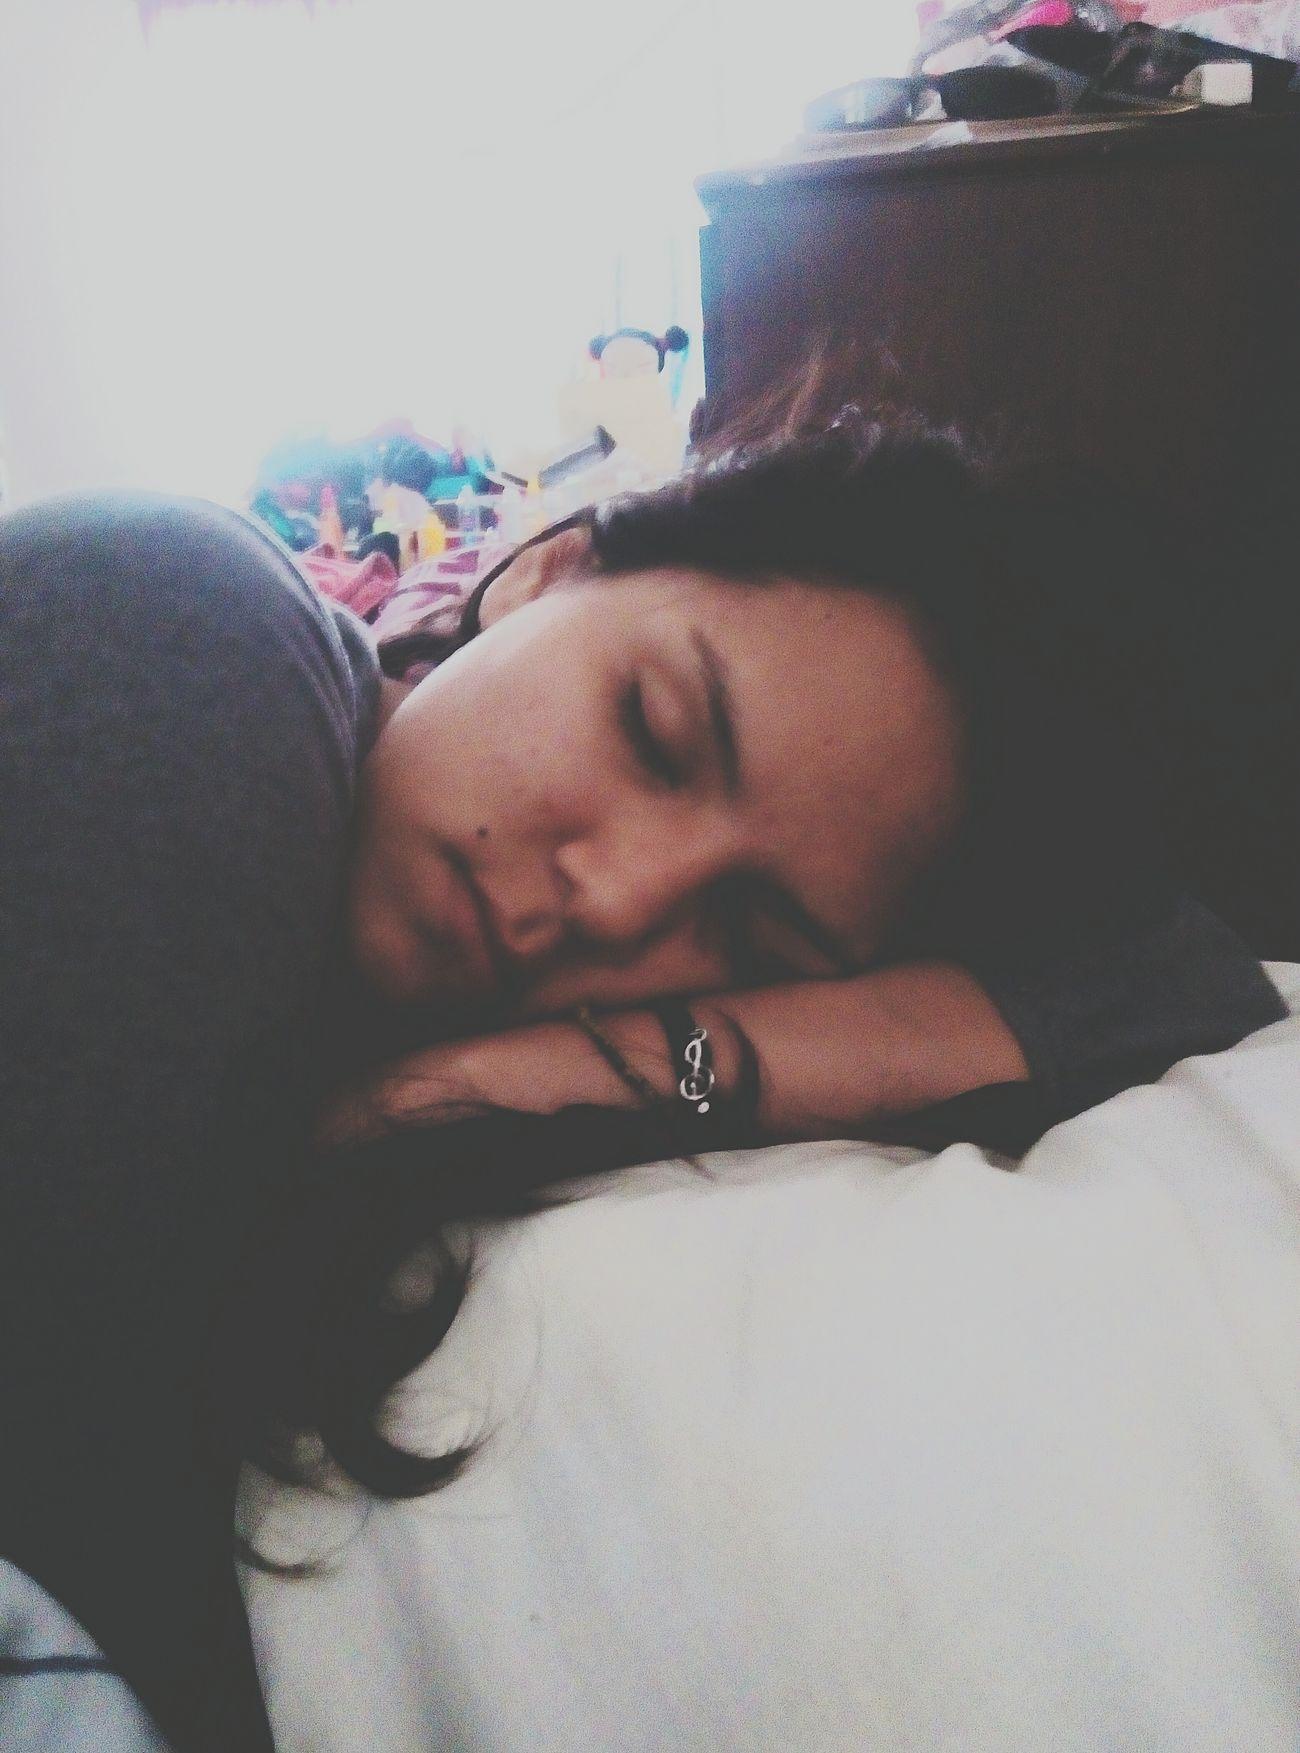 Sleeping Beauty Relaxing OpenEdit Freestylephotography Fanatico De La Fotografia :3 Enjoying Life - ILoveYou.♡ Ilikeit Beatiful Beautiful Break Home Is Where The Art Is